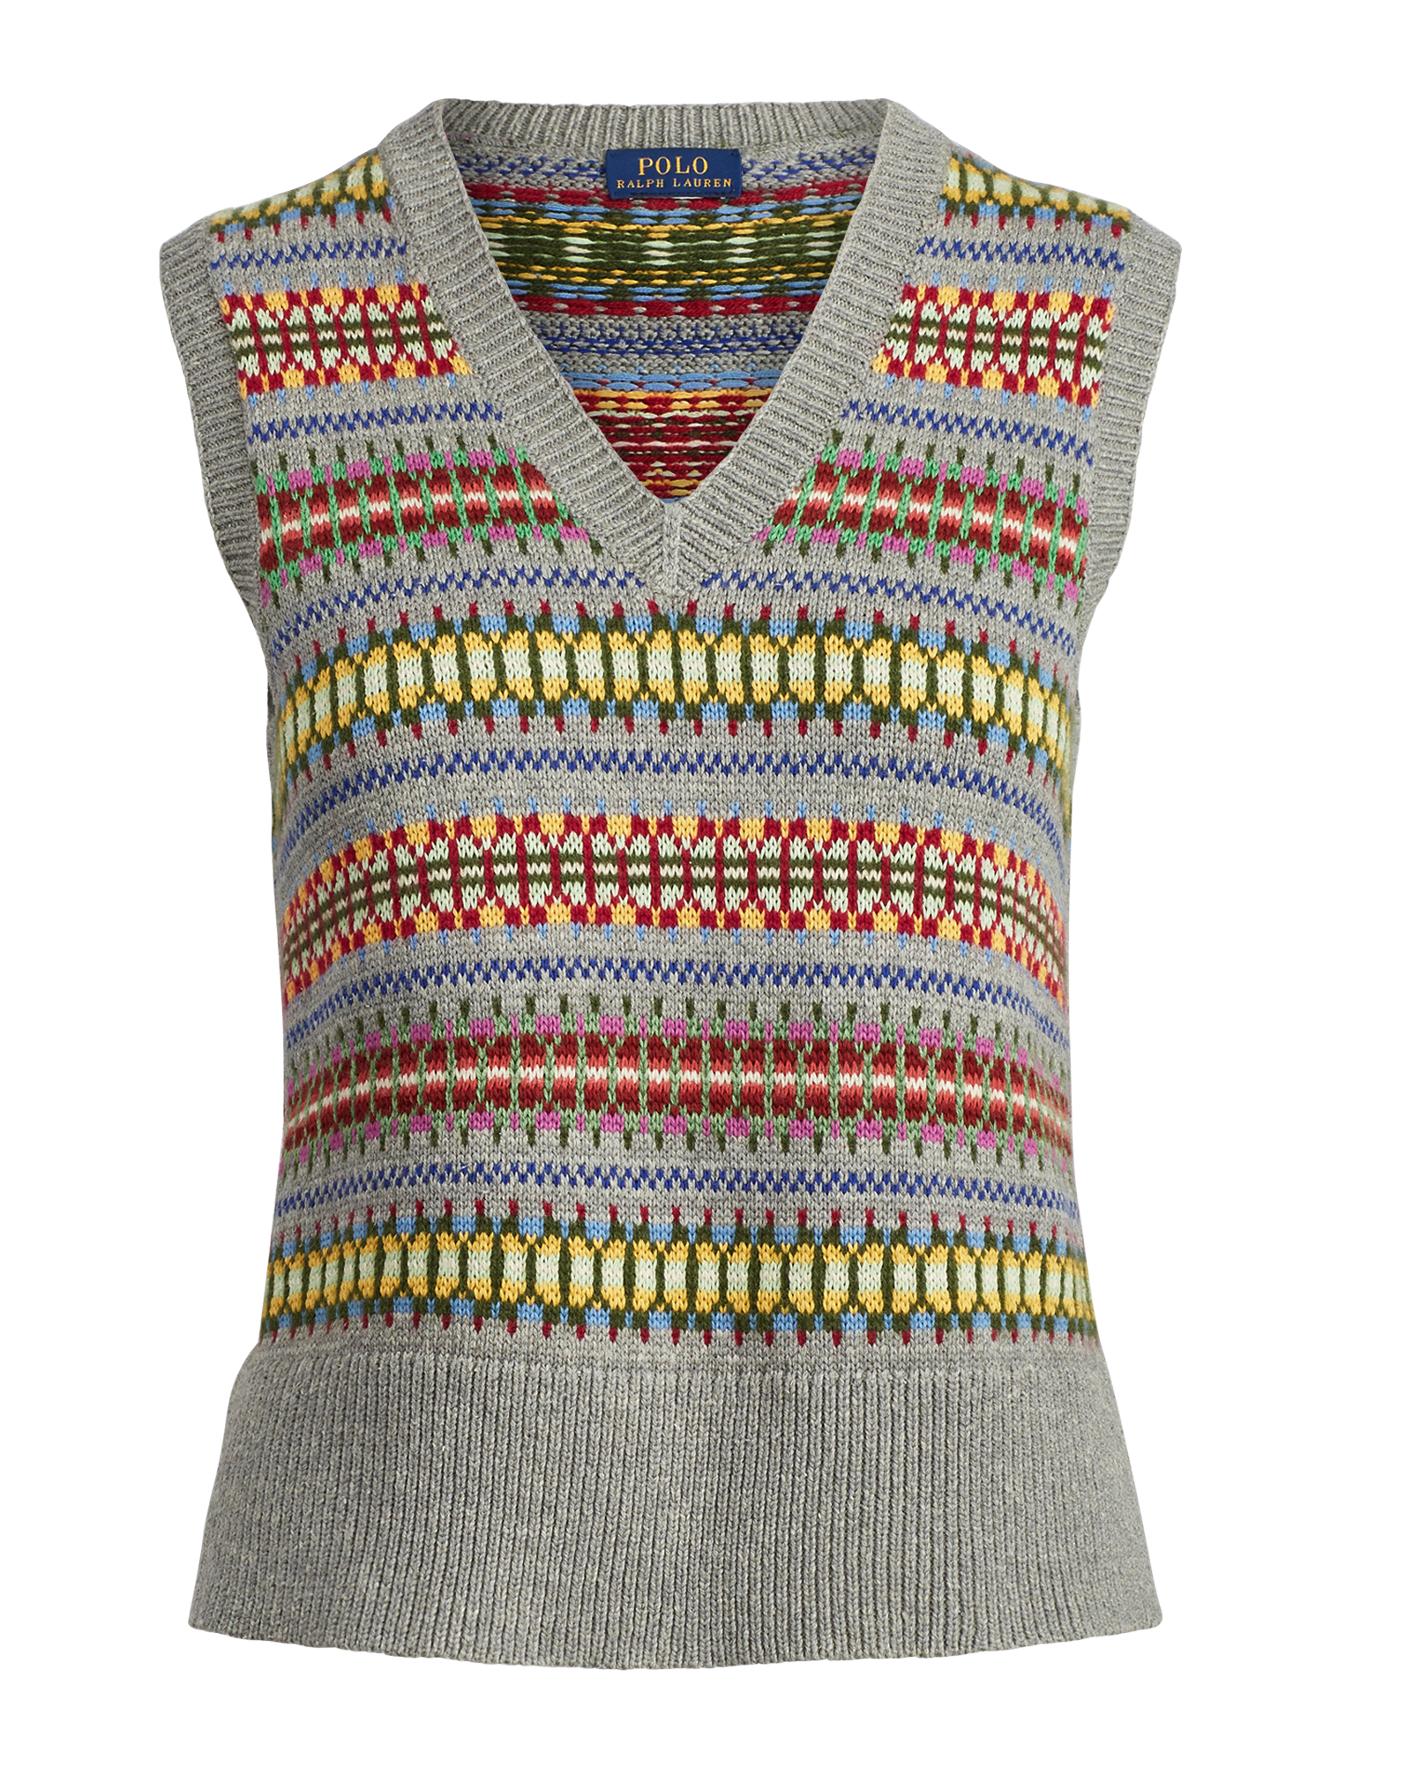 Fair Isle Sweater Vest - Polo Ralph Lauren Cashmere - RalphLauren.com - Women's V-Neck Sweaters - Knit, Wool, Cashmere Ralph Lauren